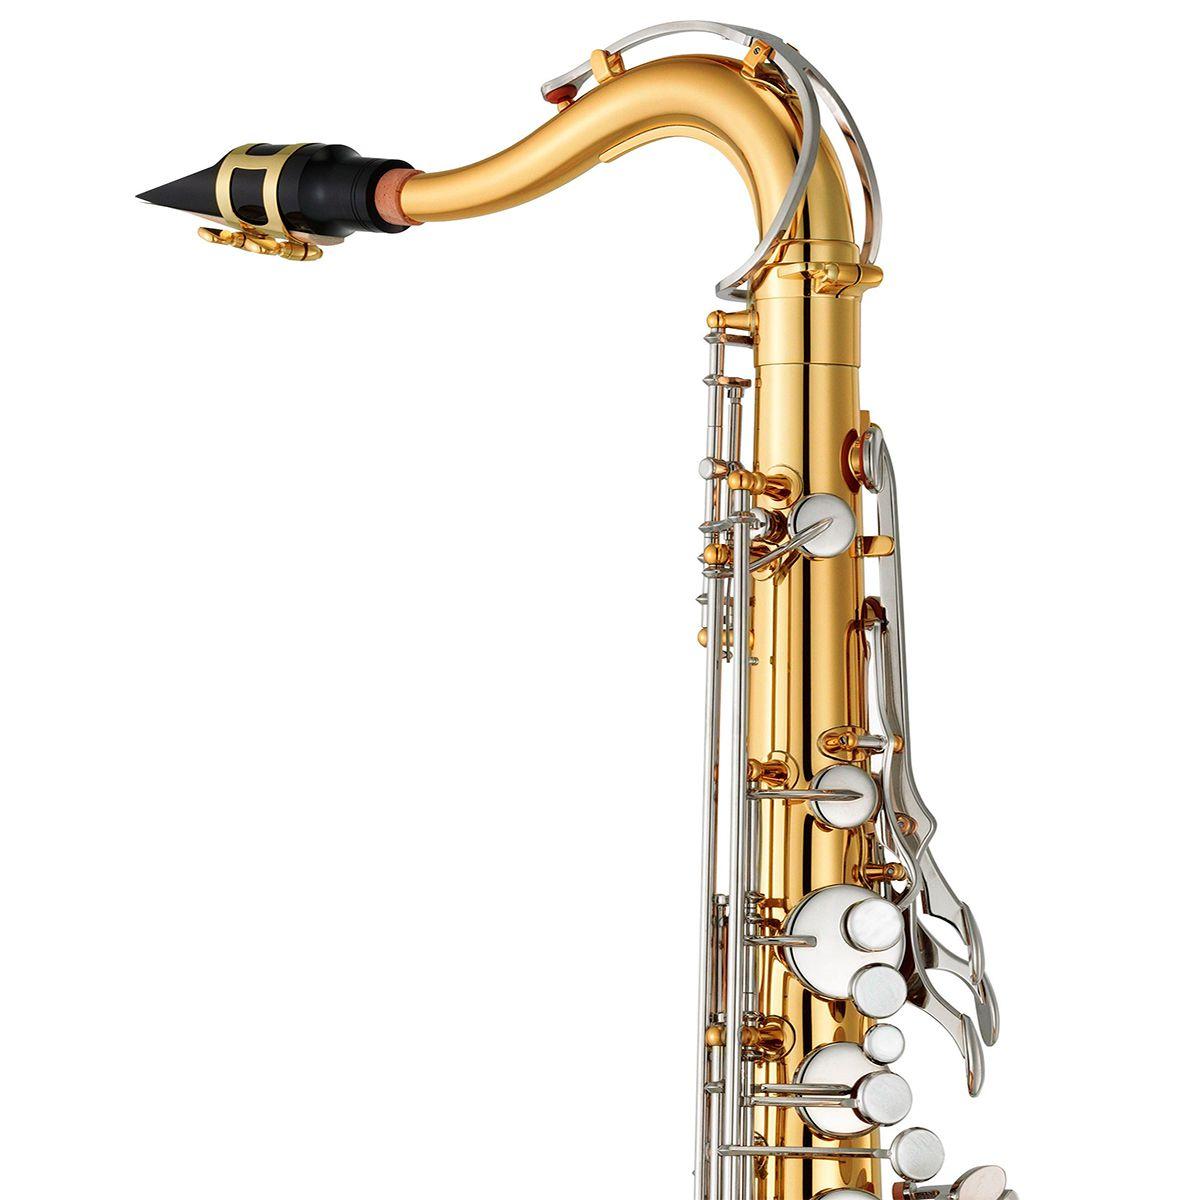 Saxofone Tenor Yamaha YTS26ID Bb Laqueado Dourado com Case